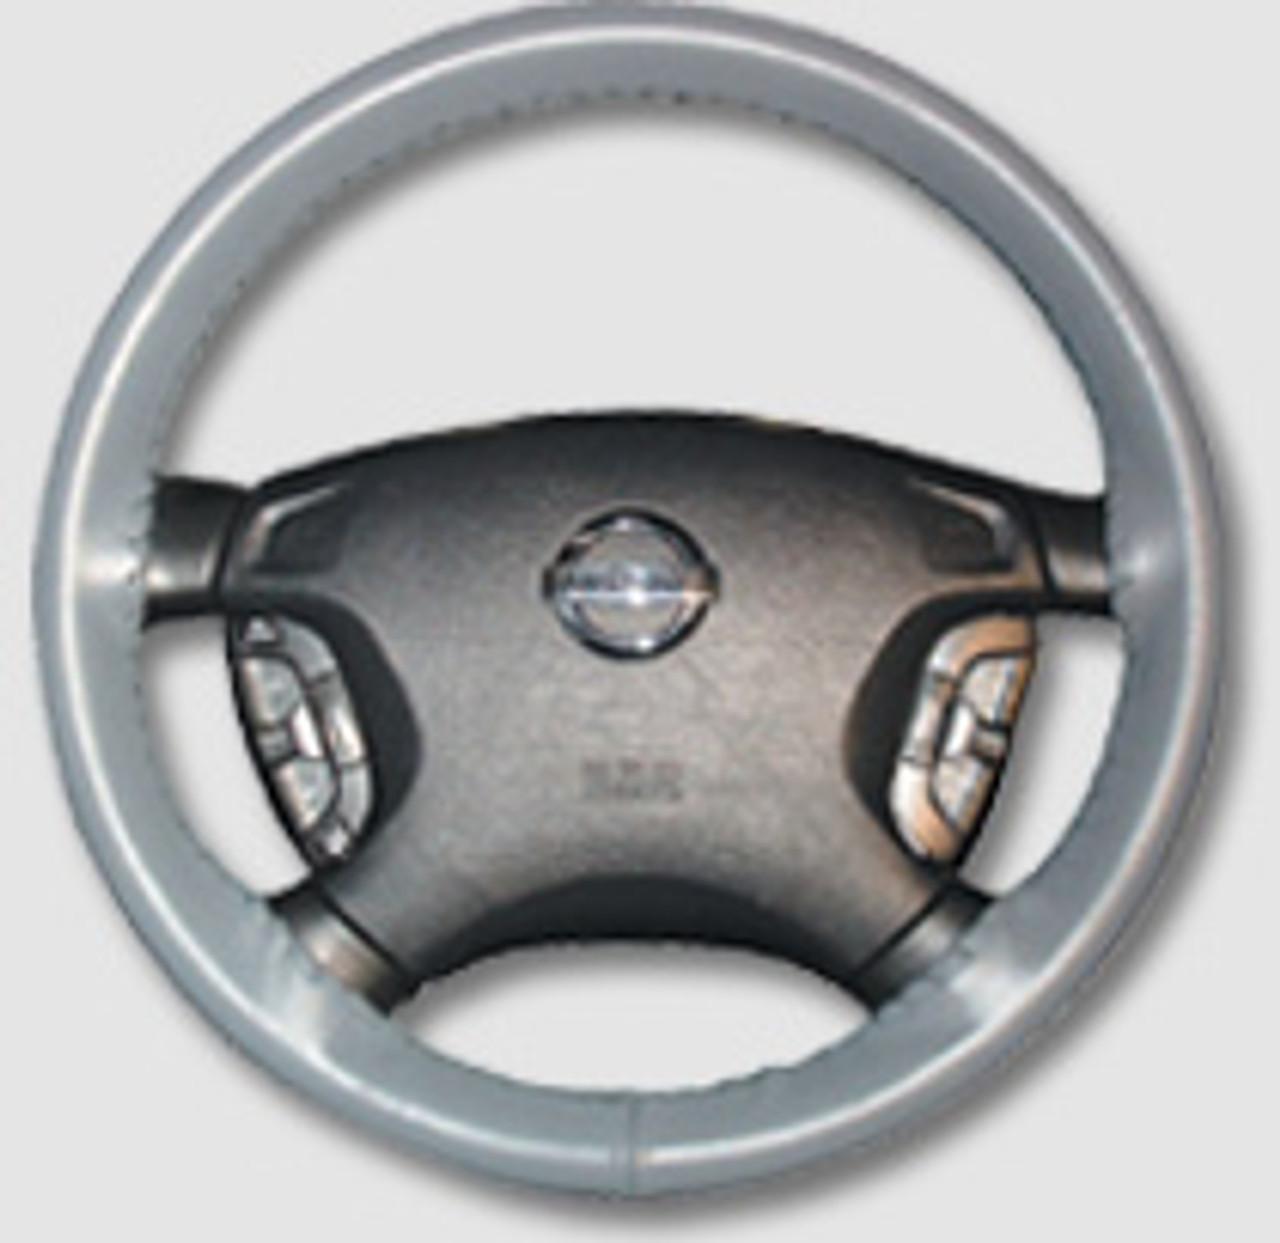 2014 Acura MDX Original WheelSkin Steering Wheel Cover